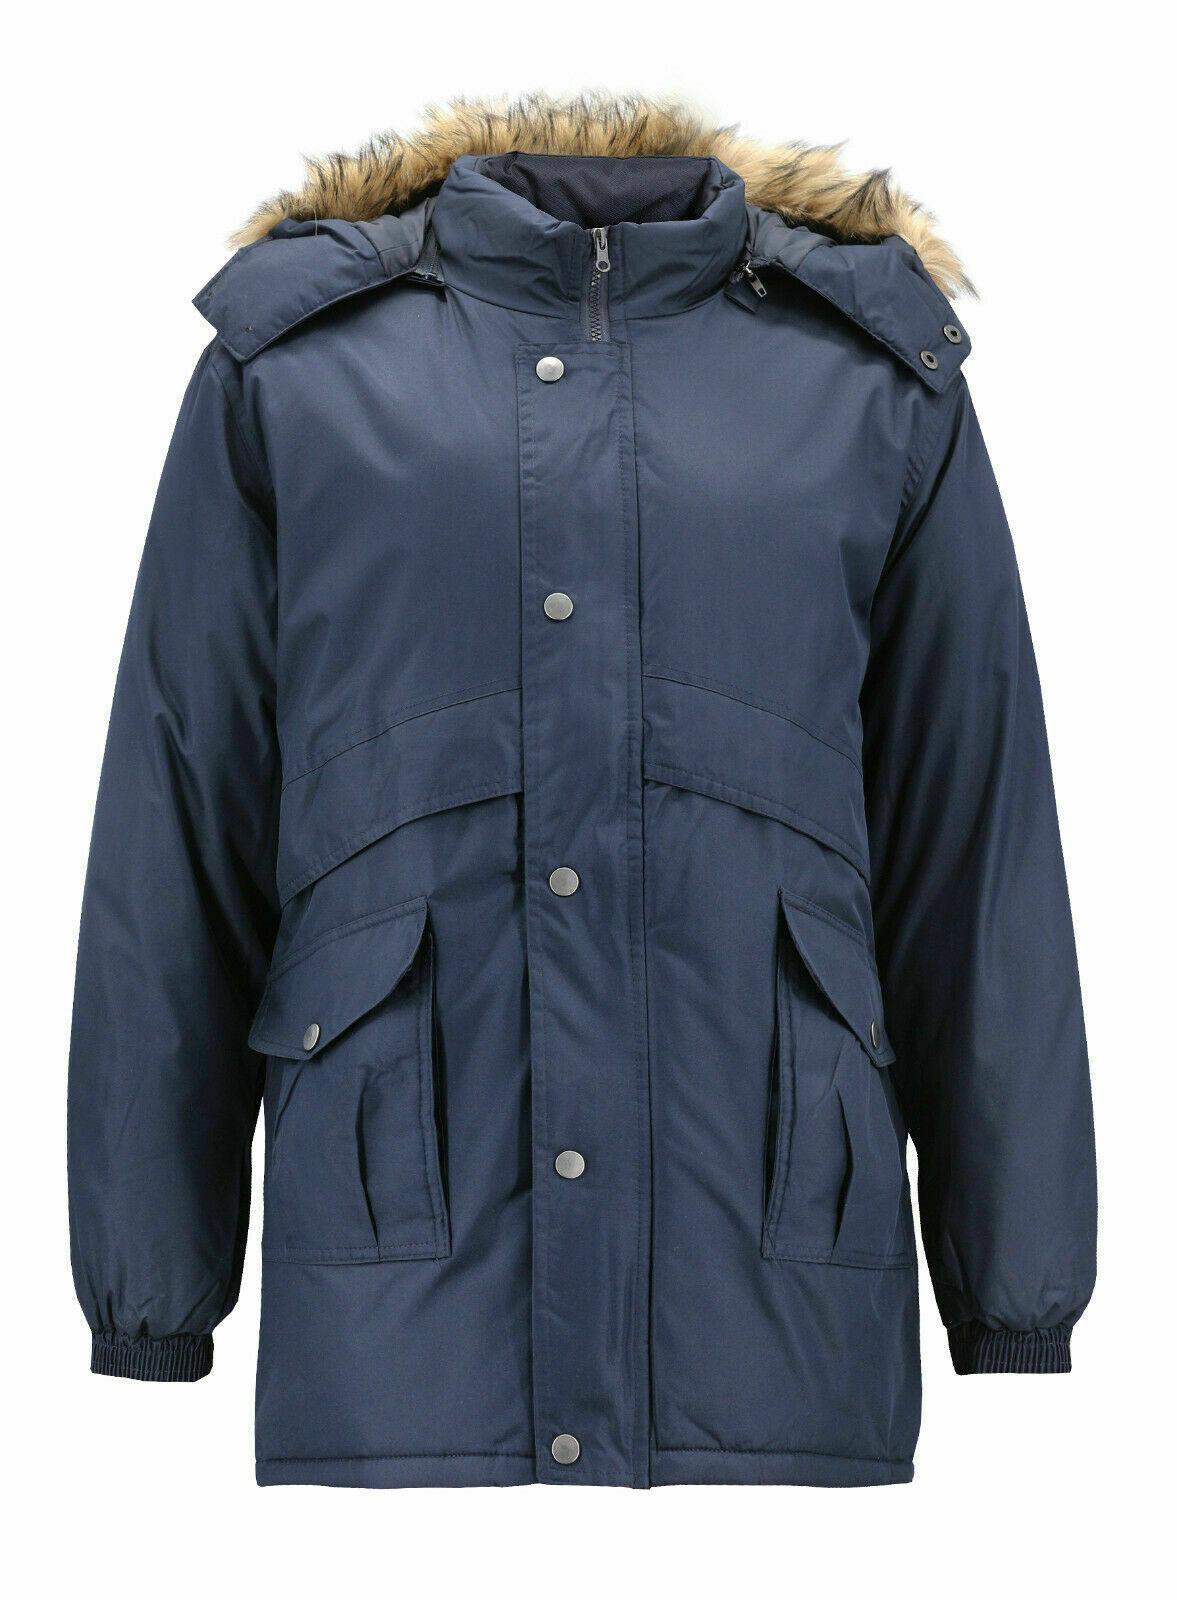 Men's Heavy Weight Winter Coat Removable Hood Puffer Parka Jacket w/ Defect  2XL